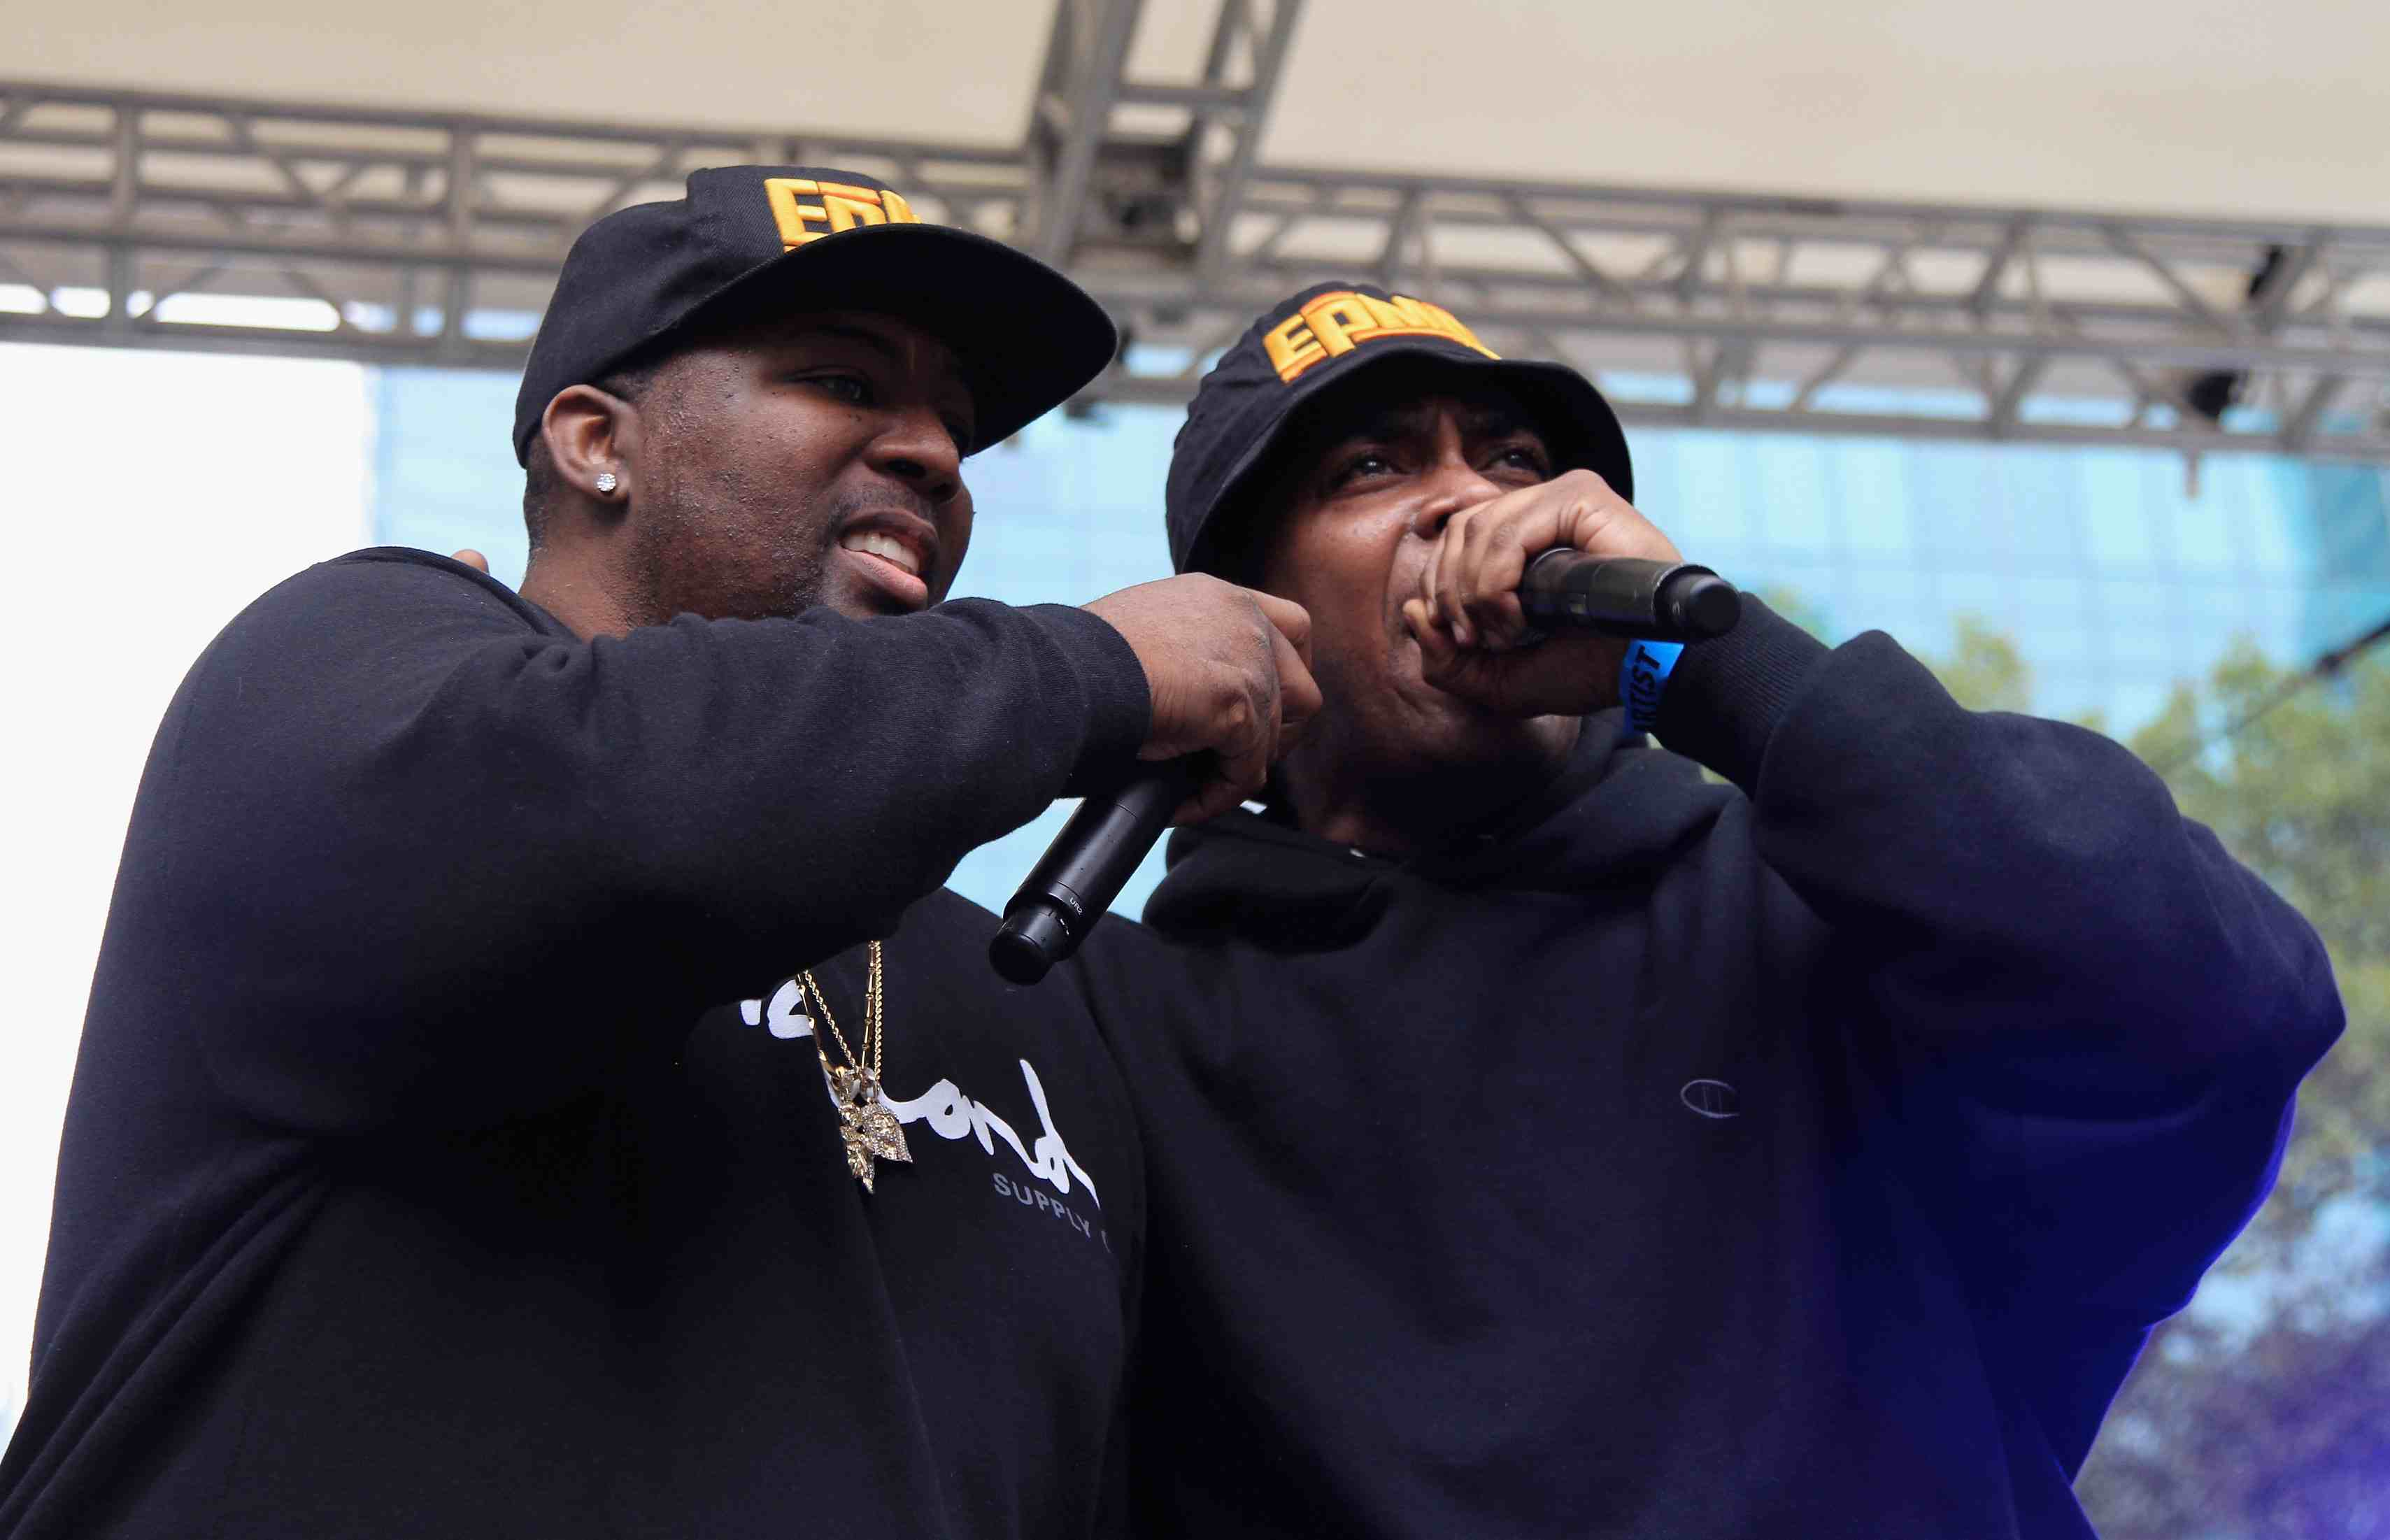 Rap duo EPMD in 2016